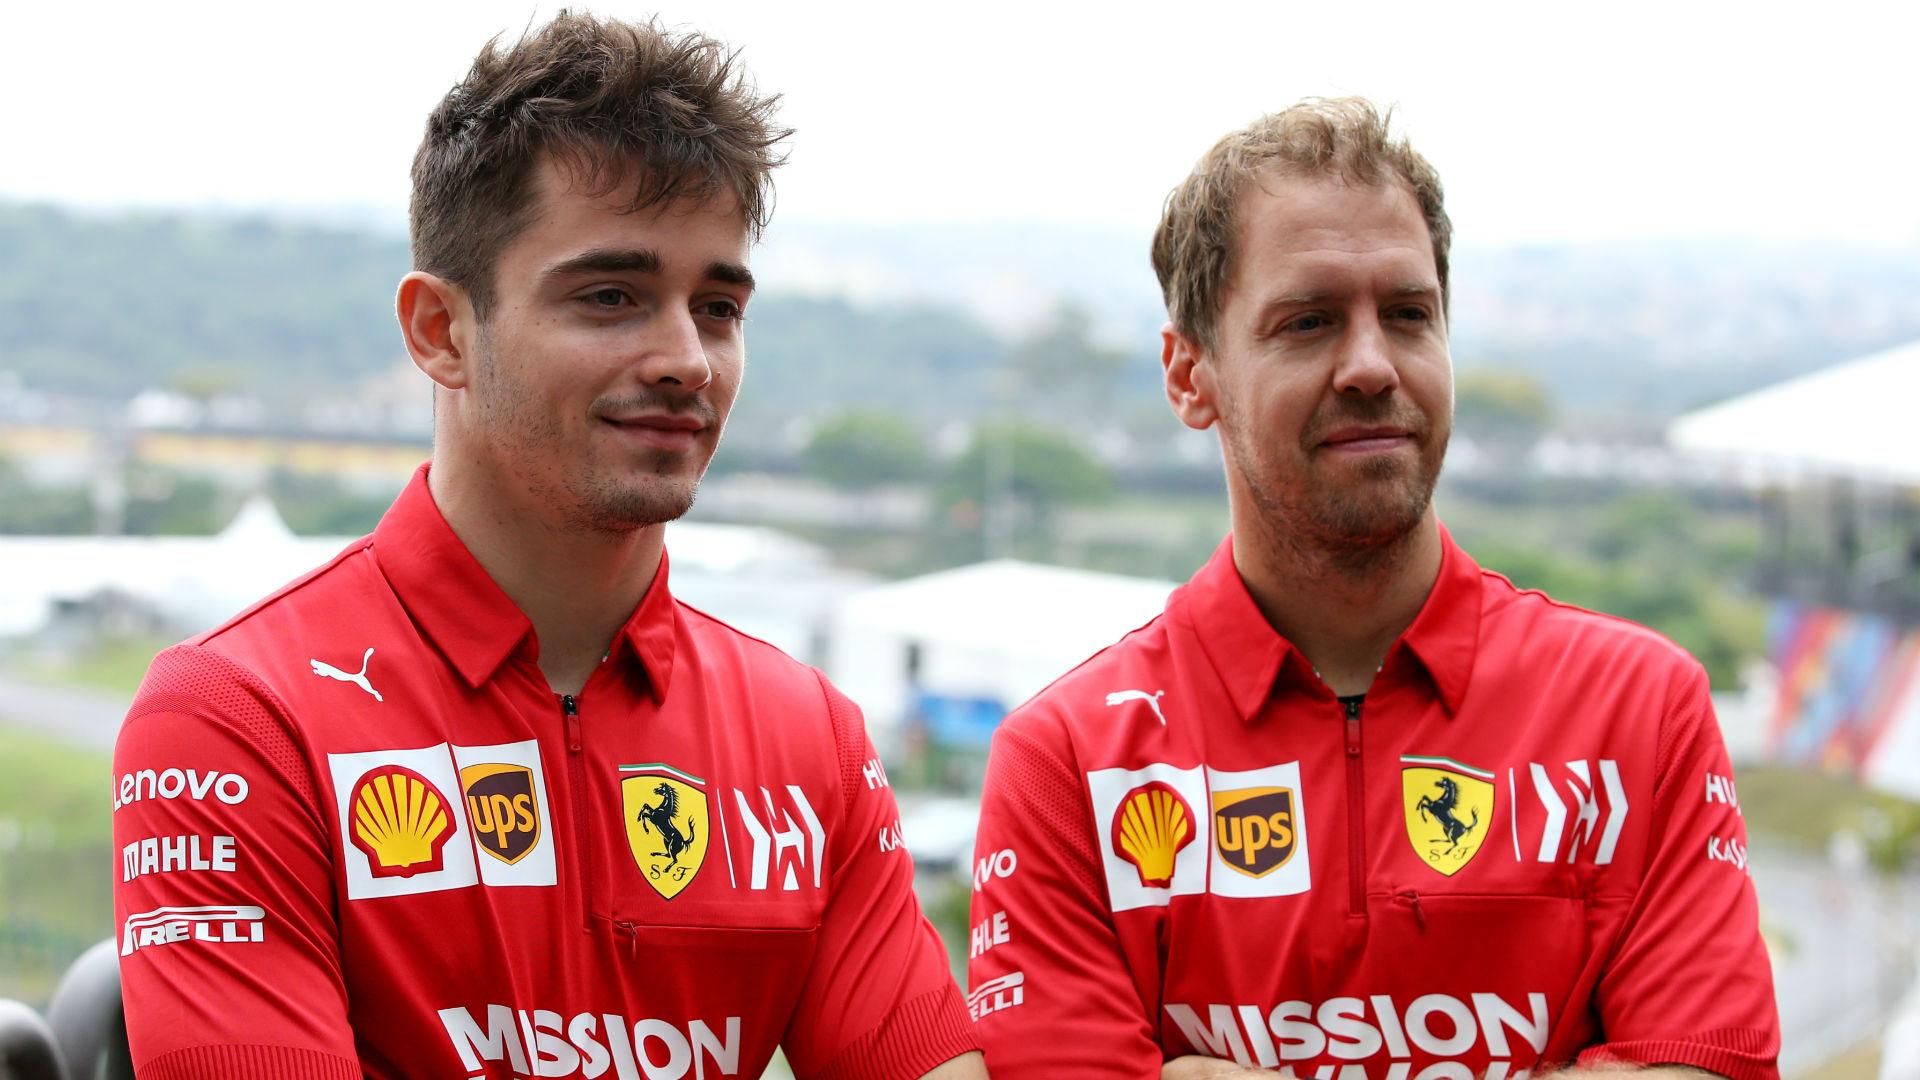 Ferrari reveal SF1000 car as they aim to end Mercedes' dominance